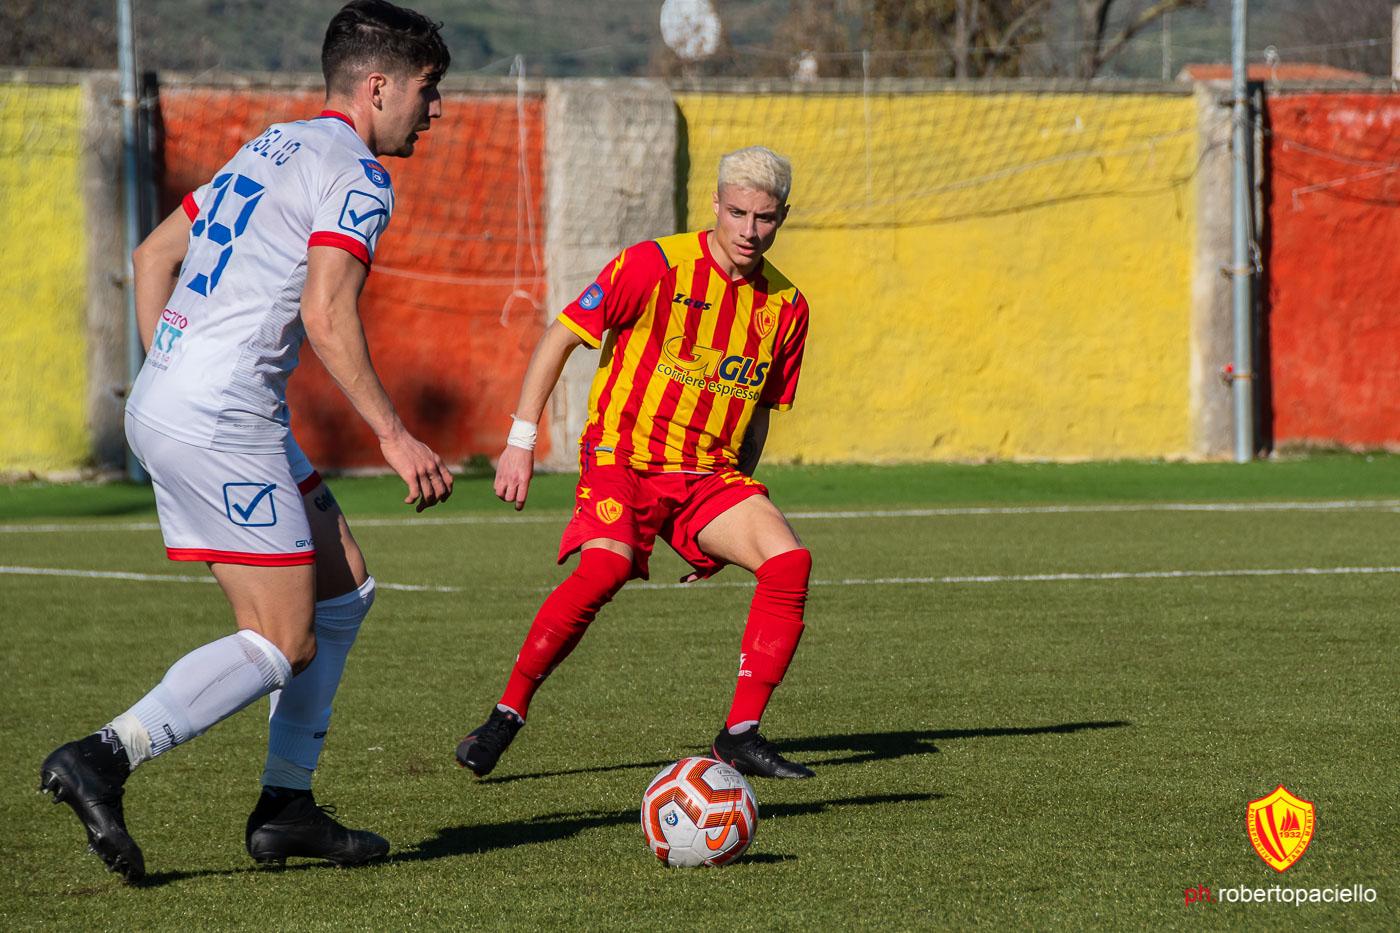 Rotonda 0-0 Polisportiva Santa Maria, post-gara con Bozzaotre